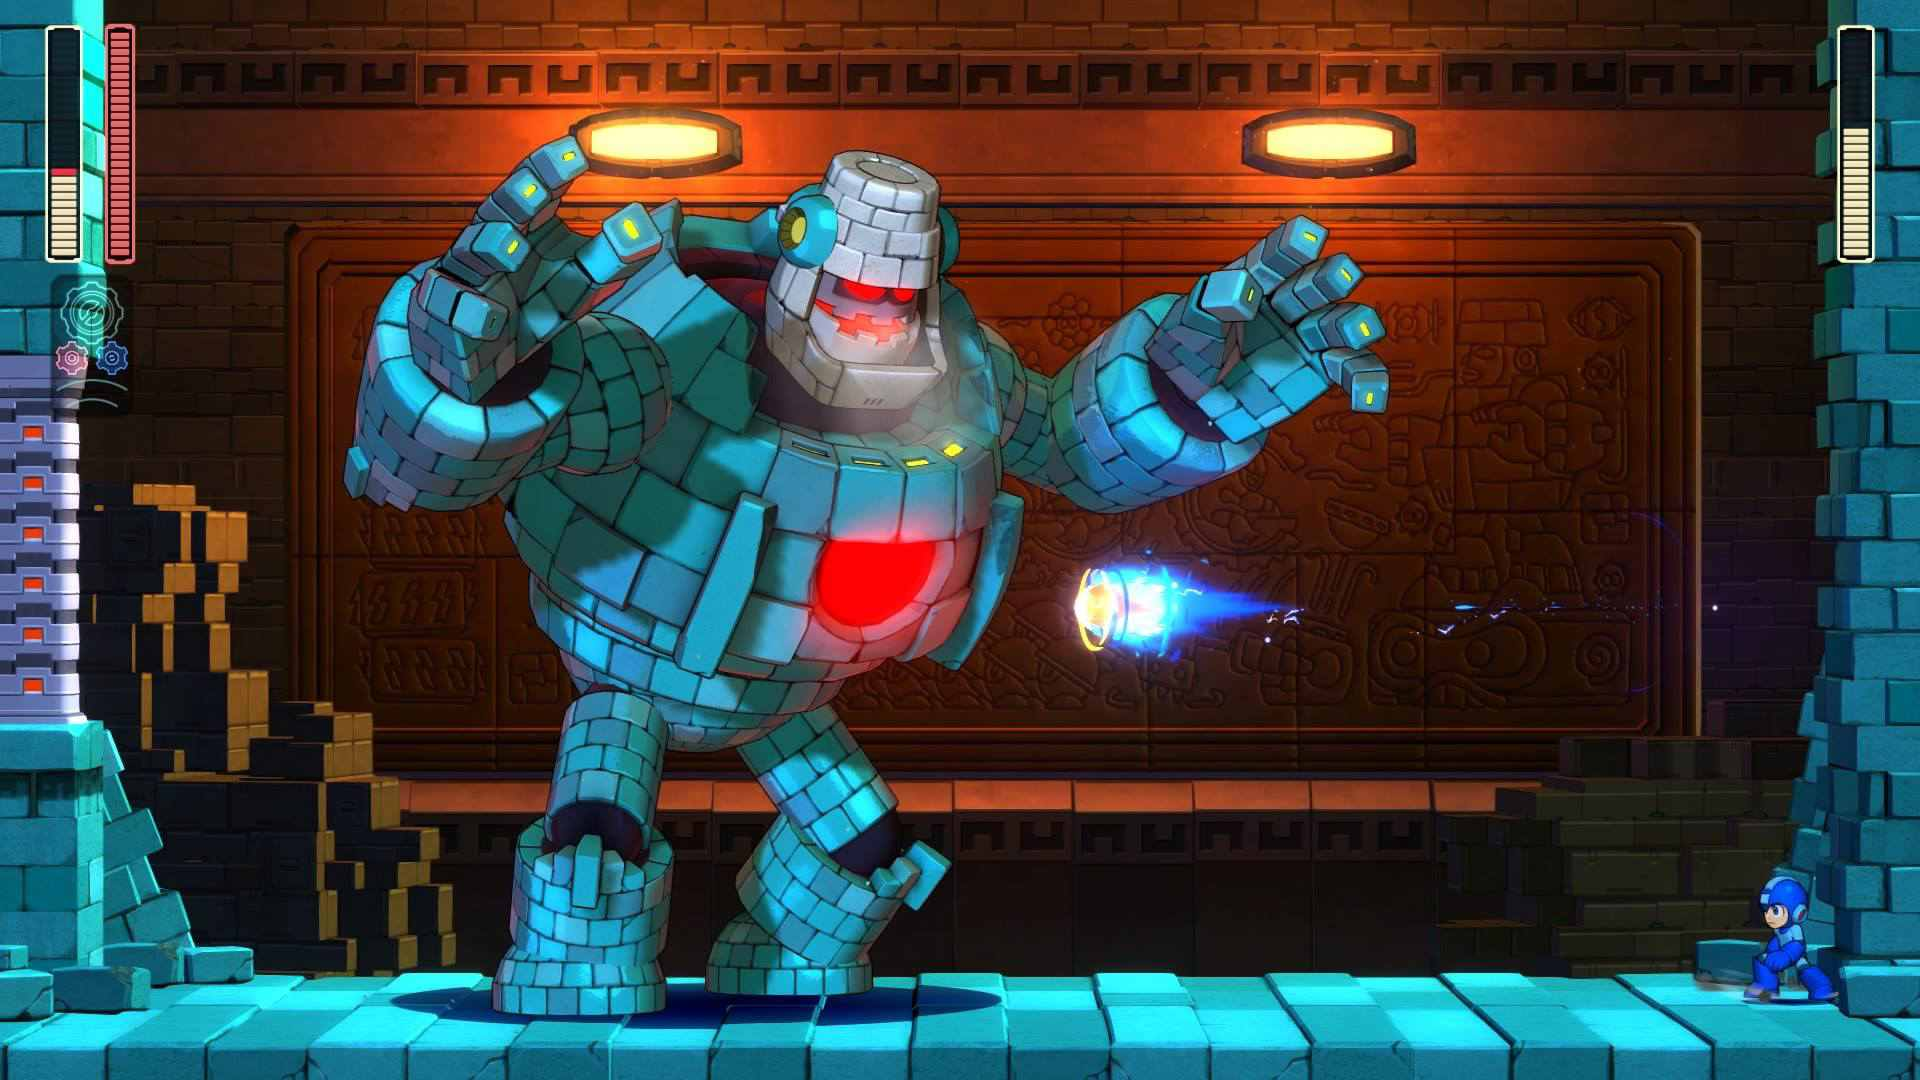 Mega Man attacks Block Man in Mega Man 11